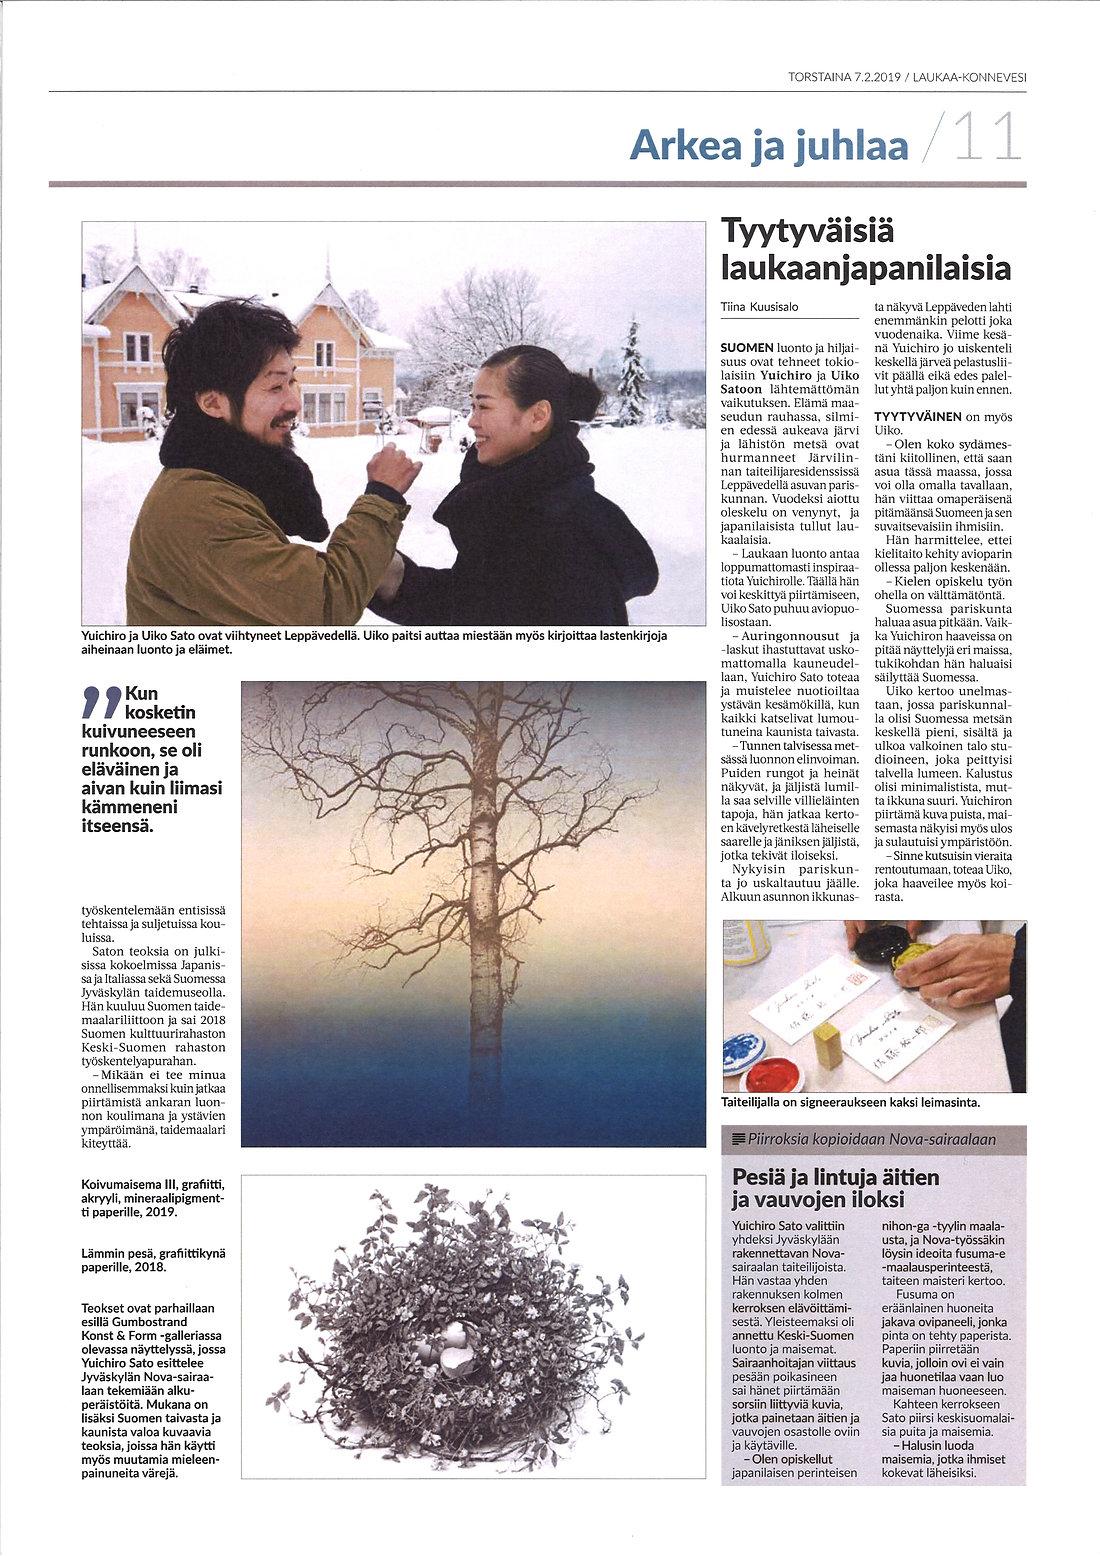 Laukaa Konnevesi 2019 2-2_page_1.jpg